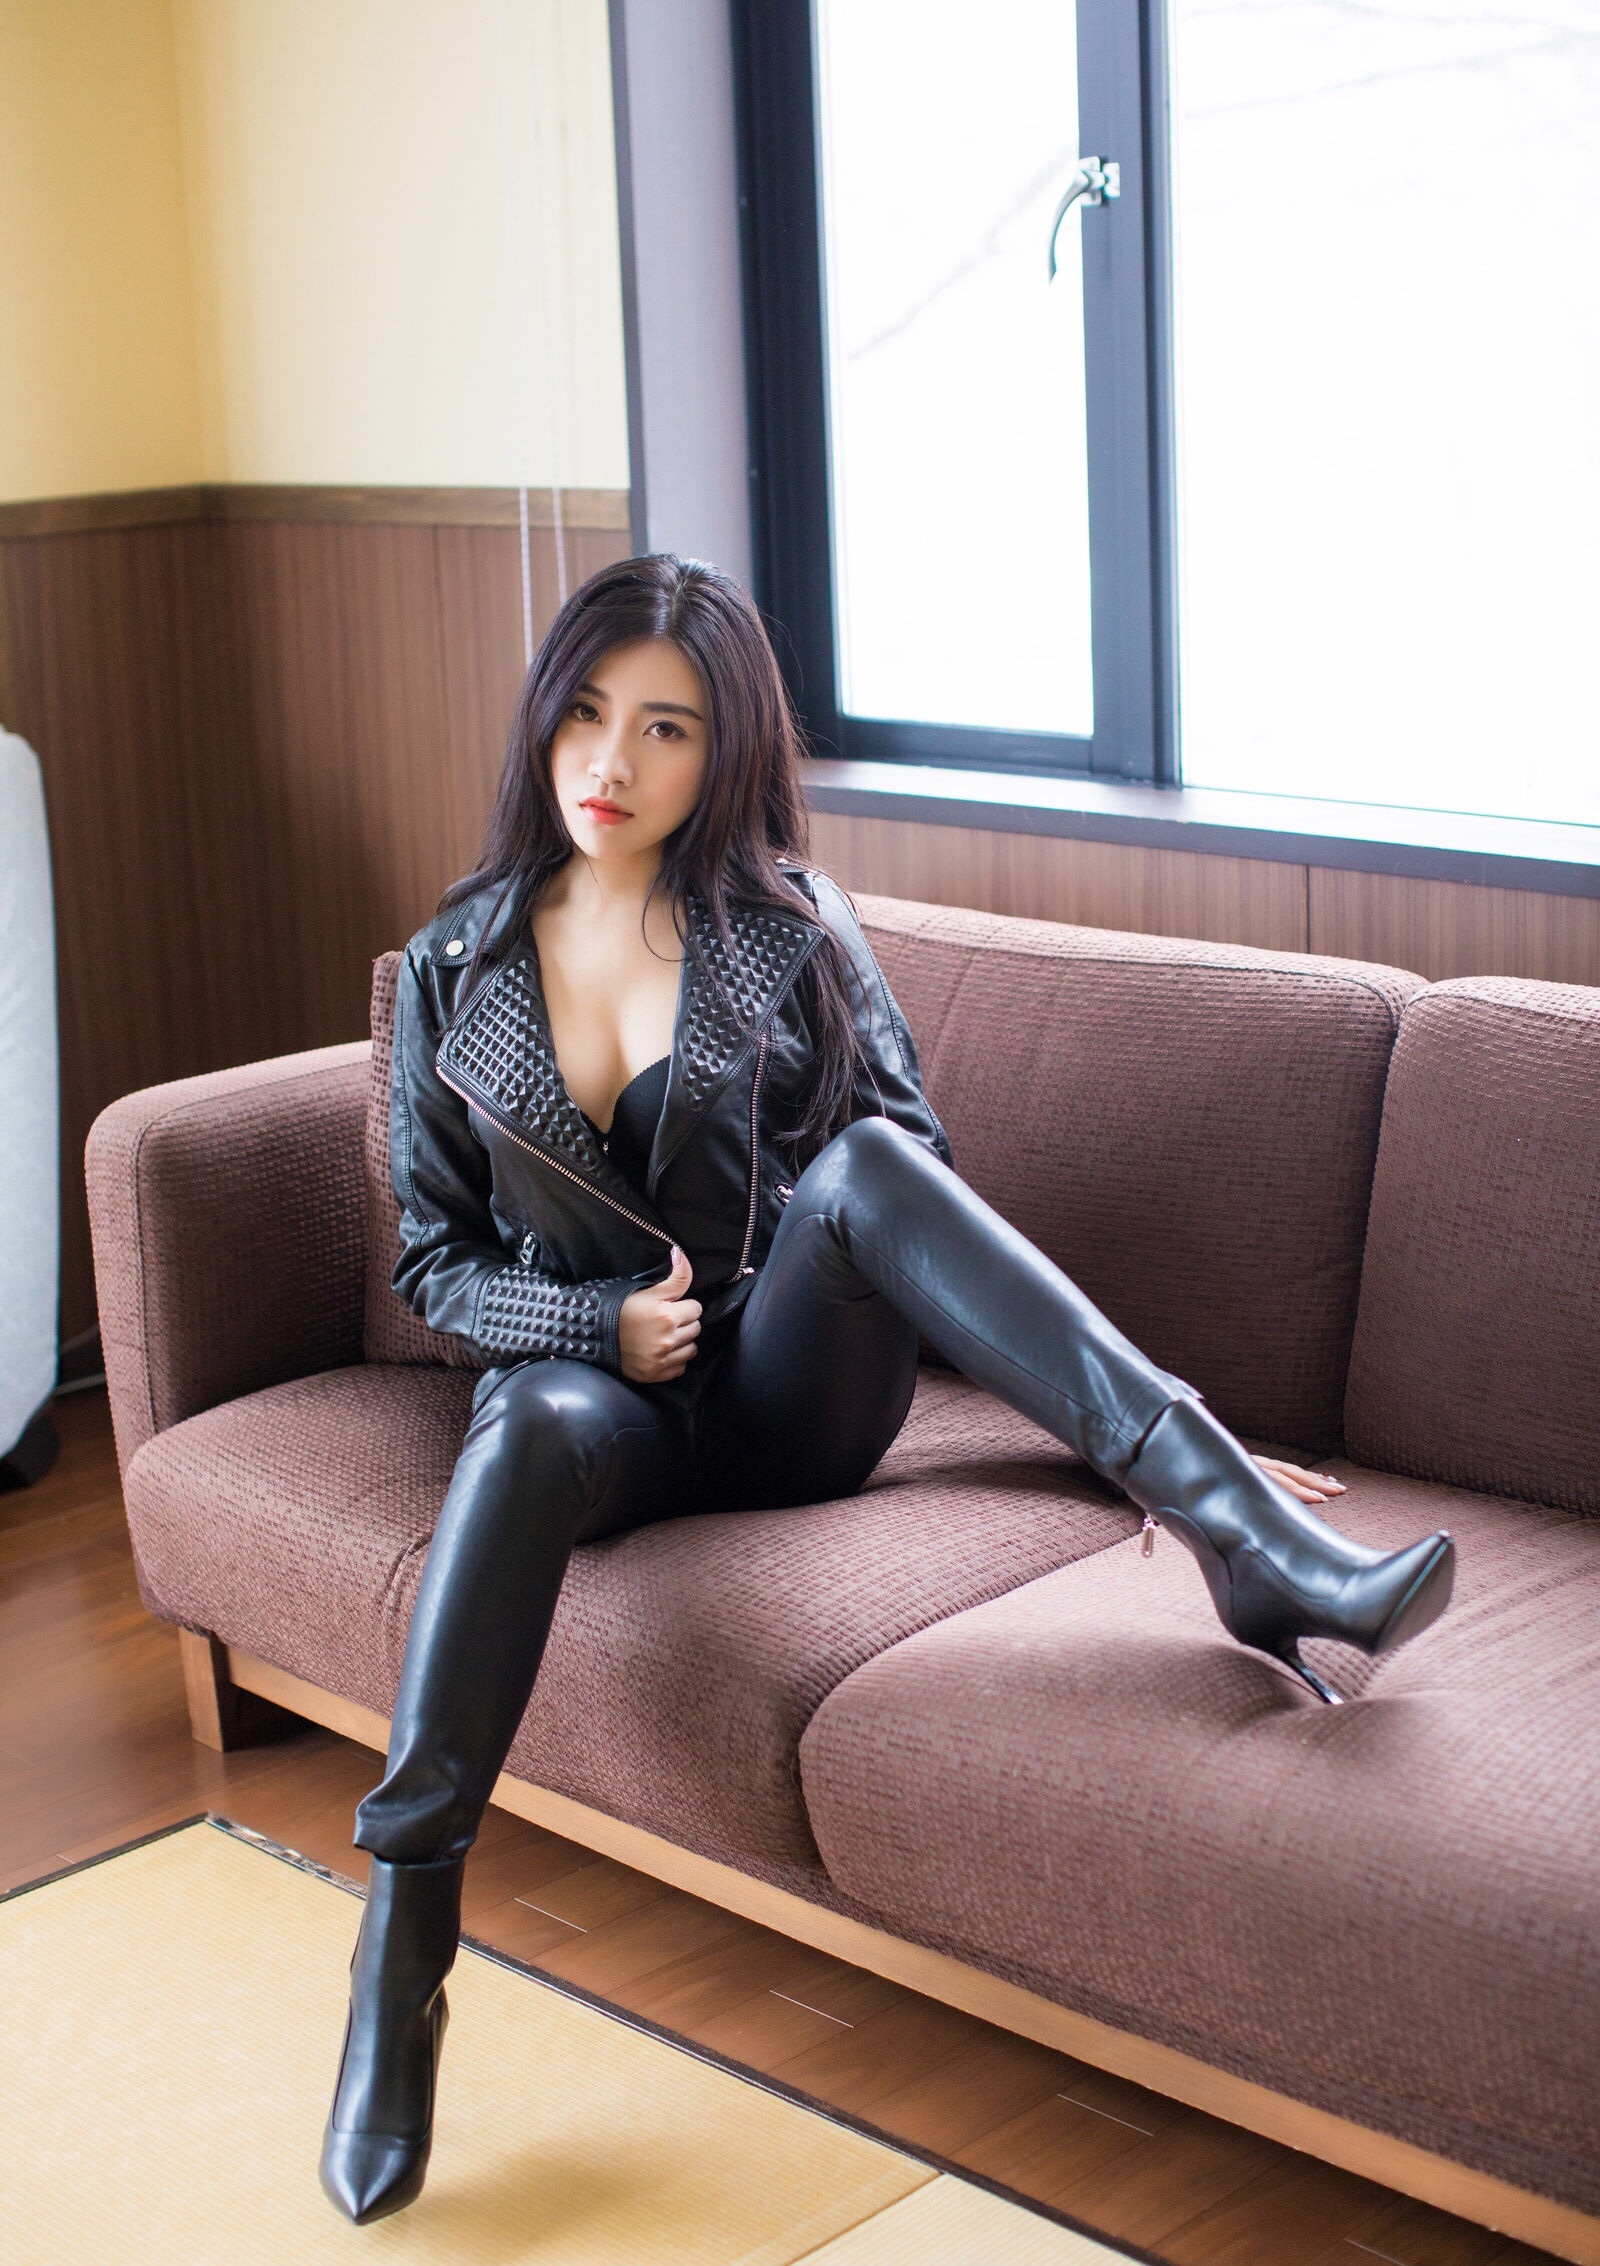 Xu Nuoのセクシーなレザーパンツ足 11